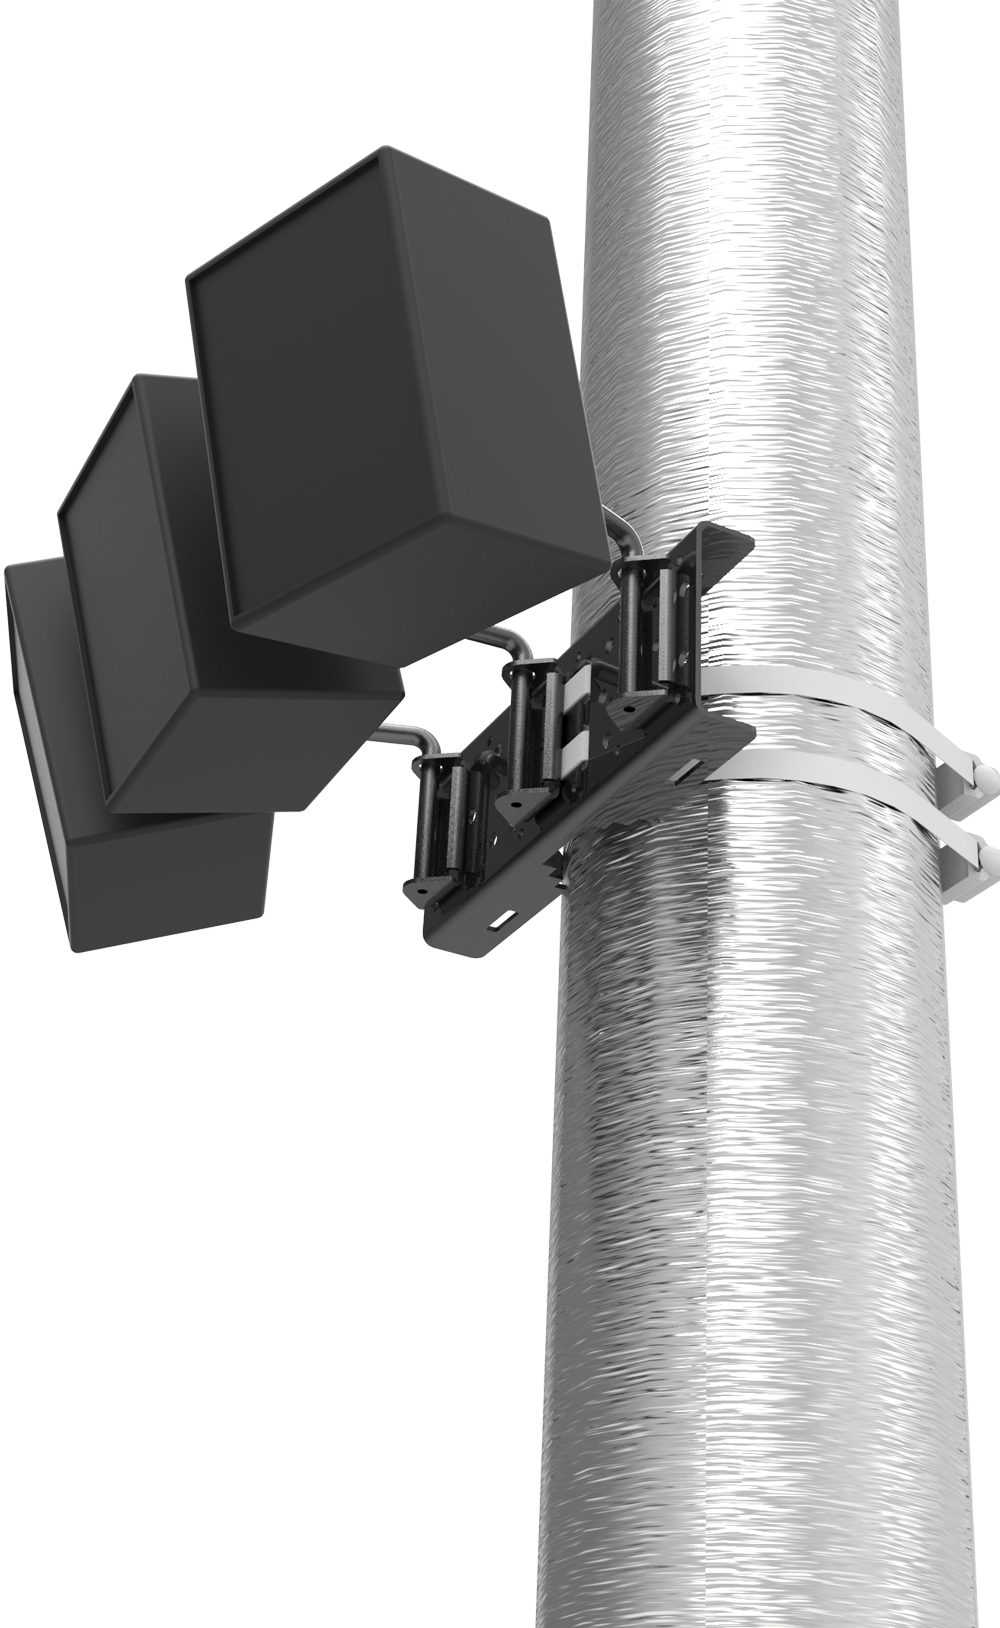 Indoor Audio Pole Mounts Configurations   Adaptive